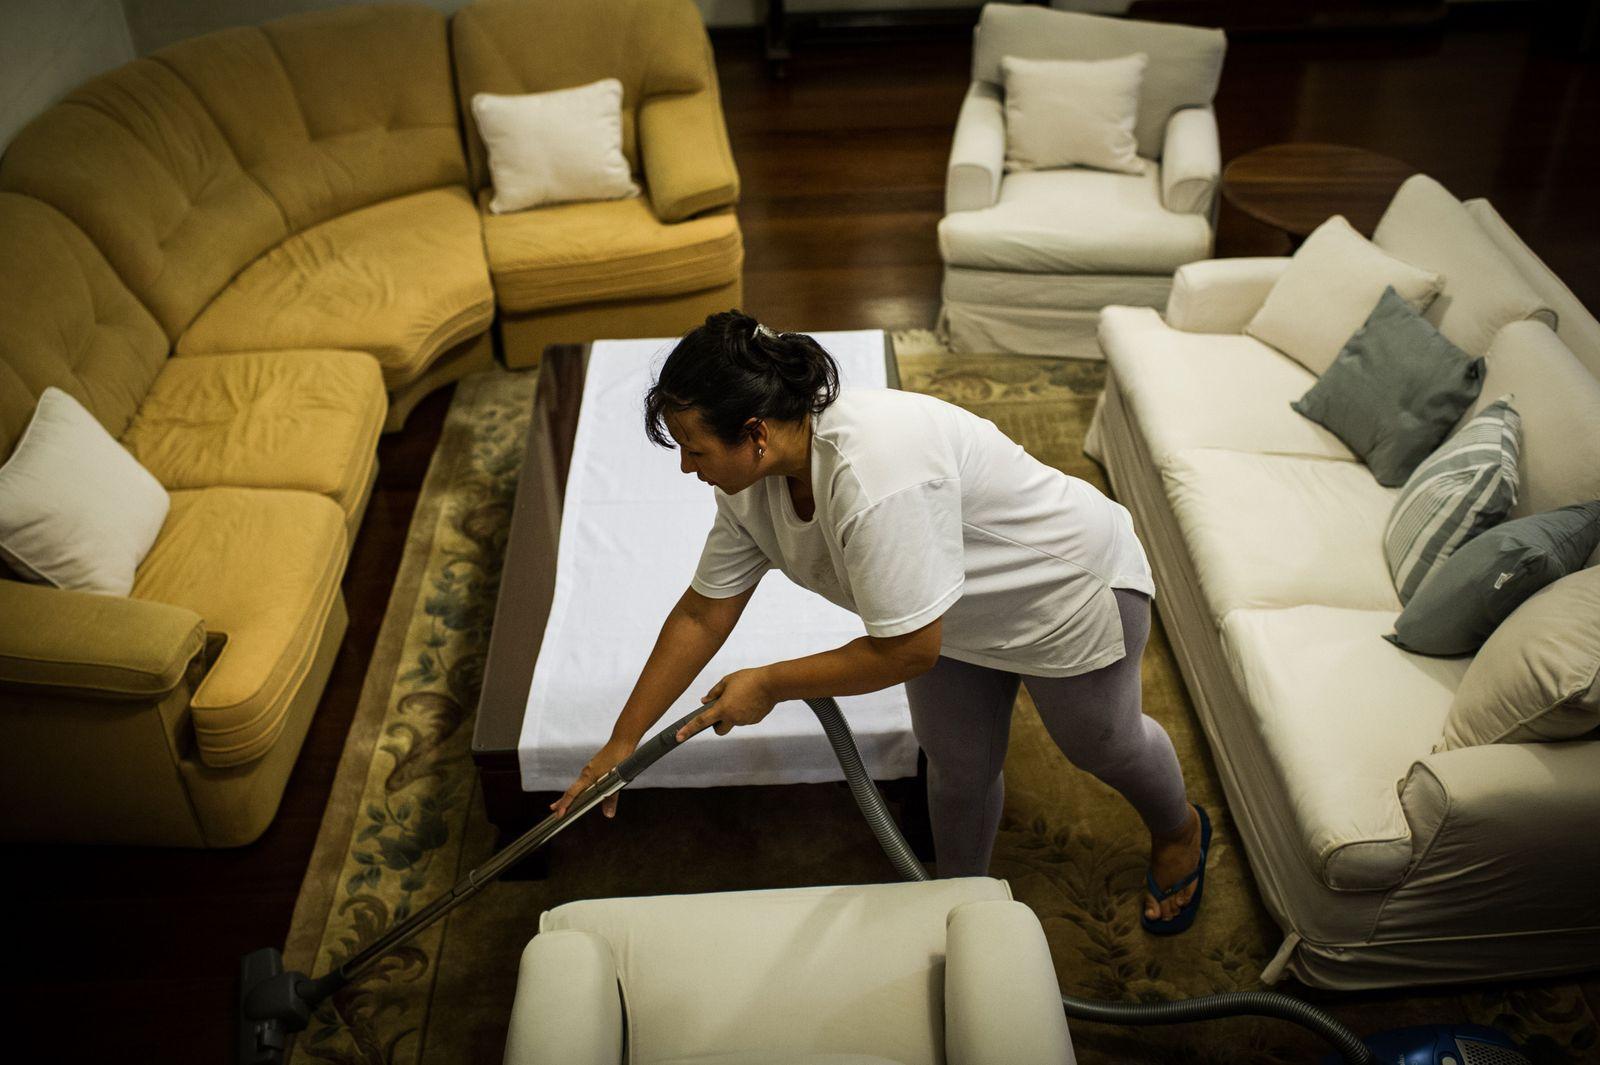 BRAZIL-SOCIAL-ECONOMY-JOBS-HOUSEKEEPING